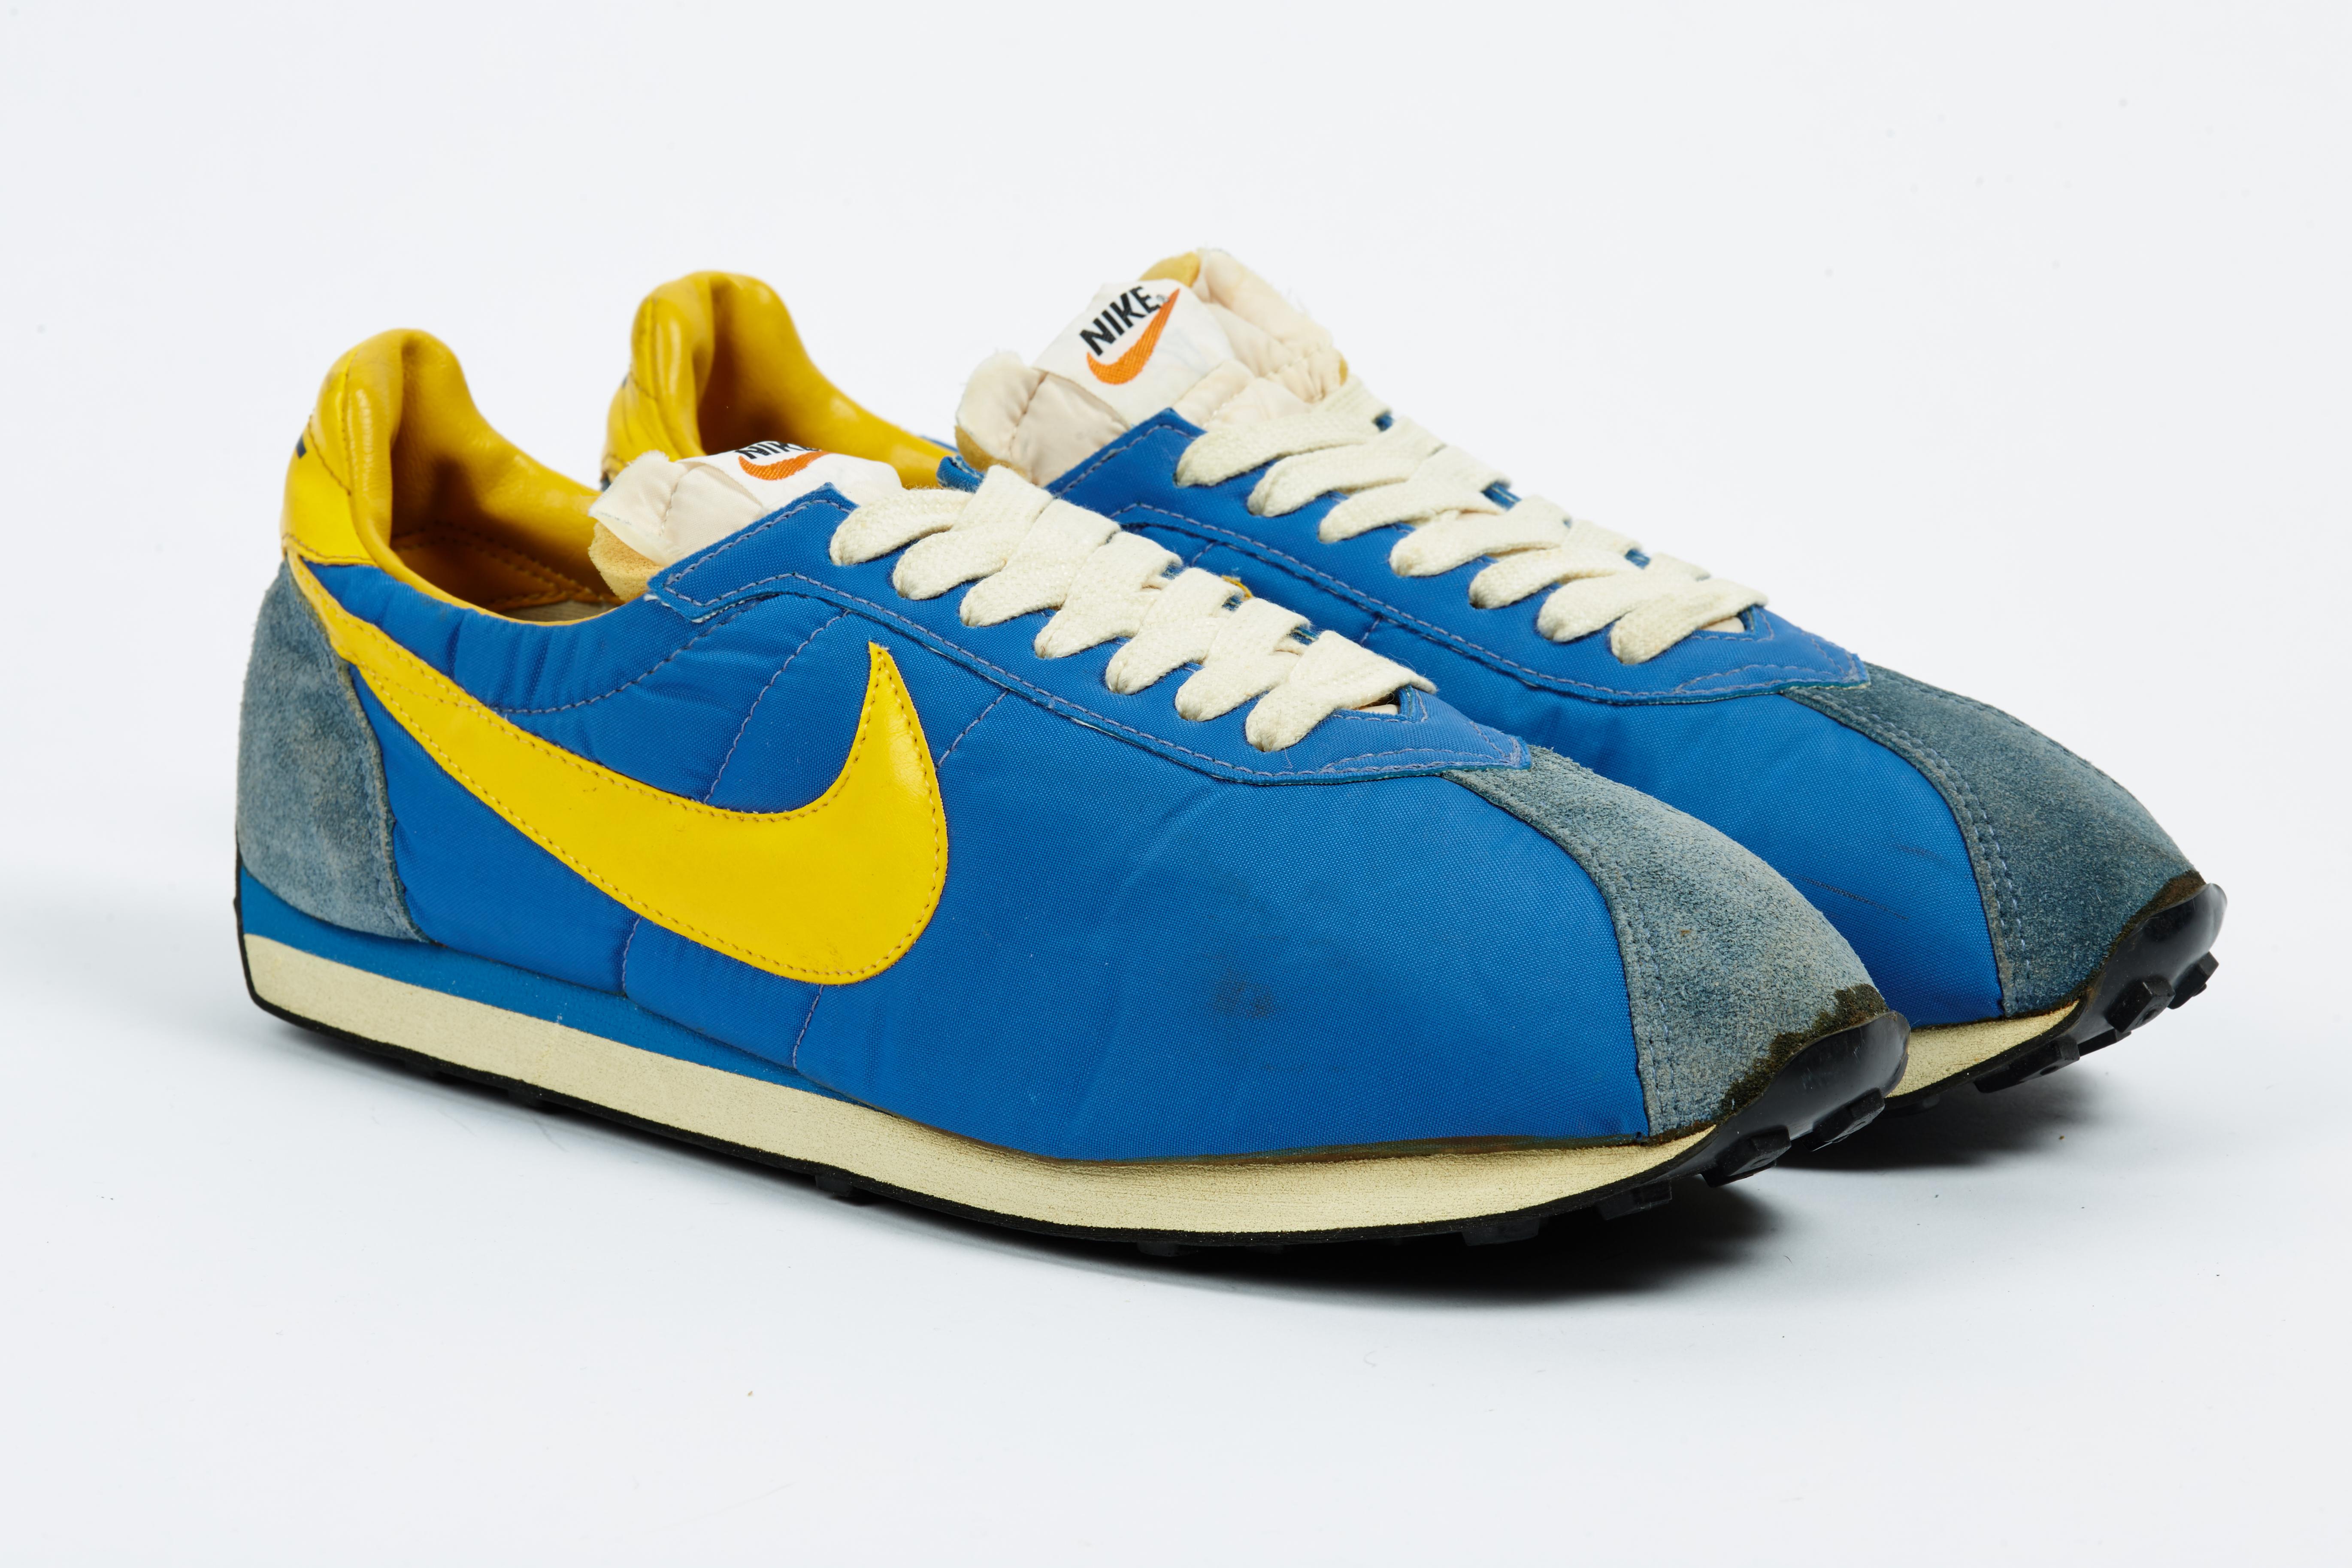 Vintage 1977 Nike Waffle Trainer - Shoes Your Vintage 38deae019